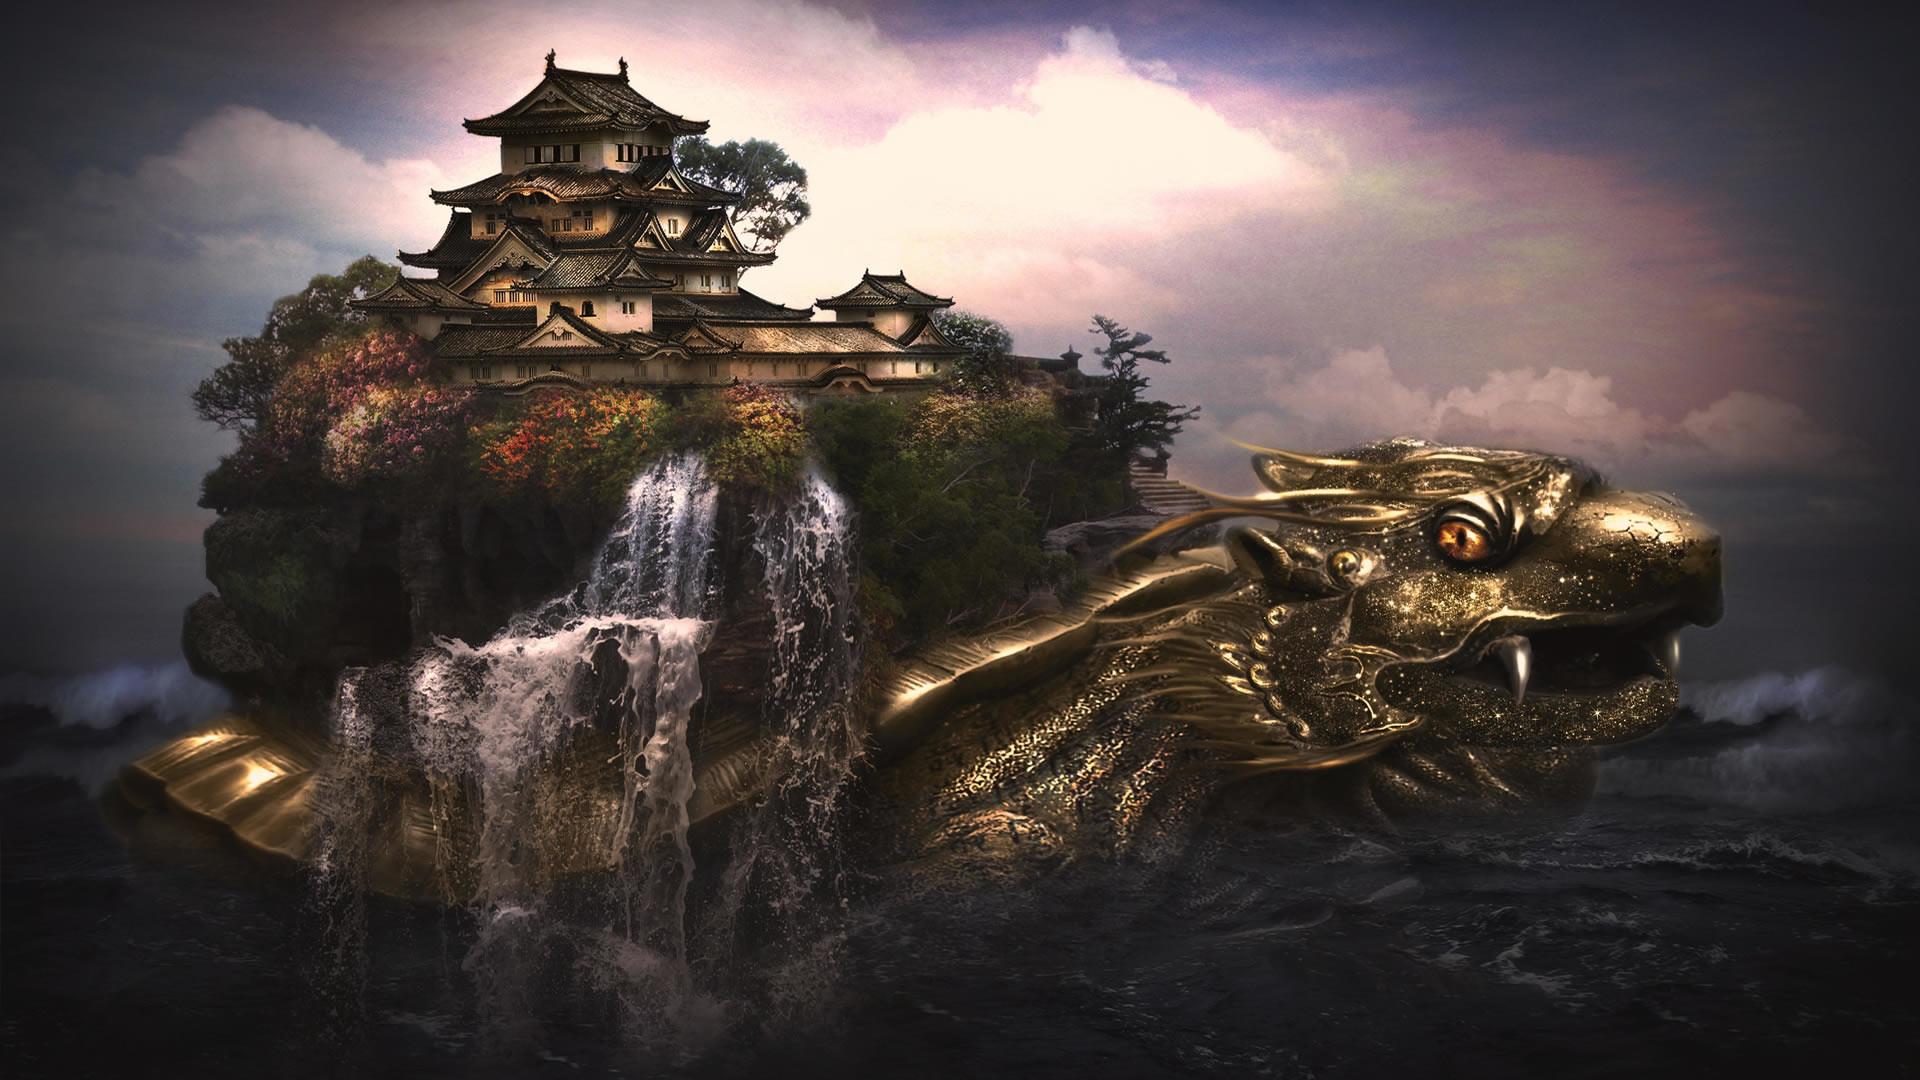 Res: 1920x1080, Dragon Landscape Wallpaper Free Desktop by tapeper